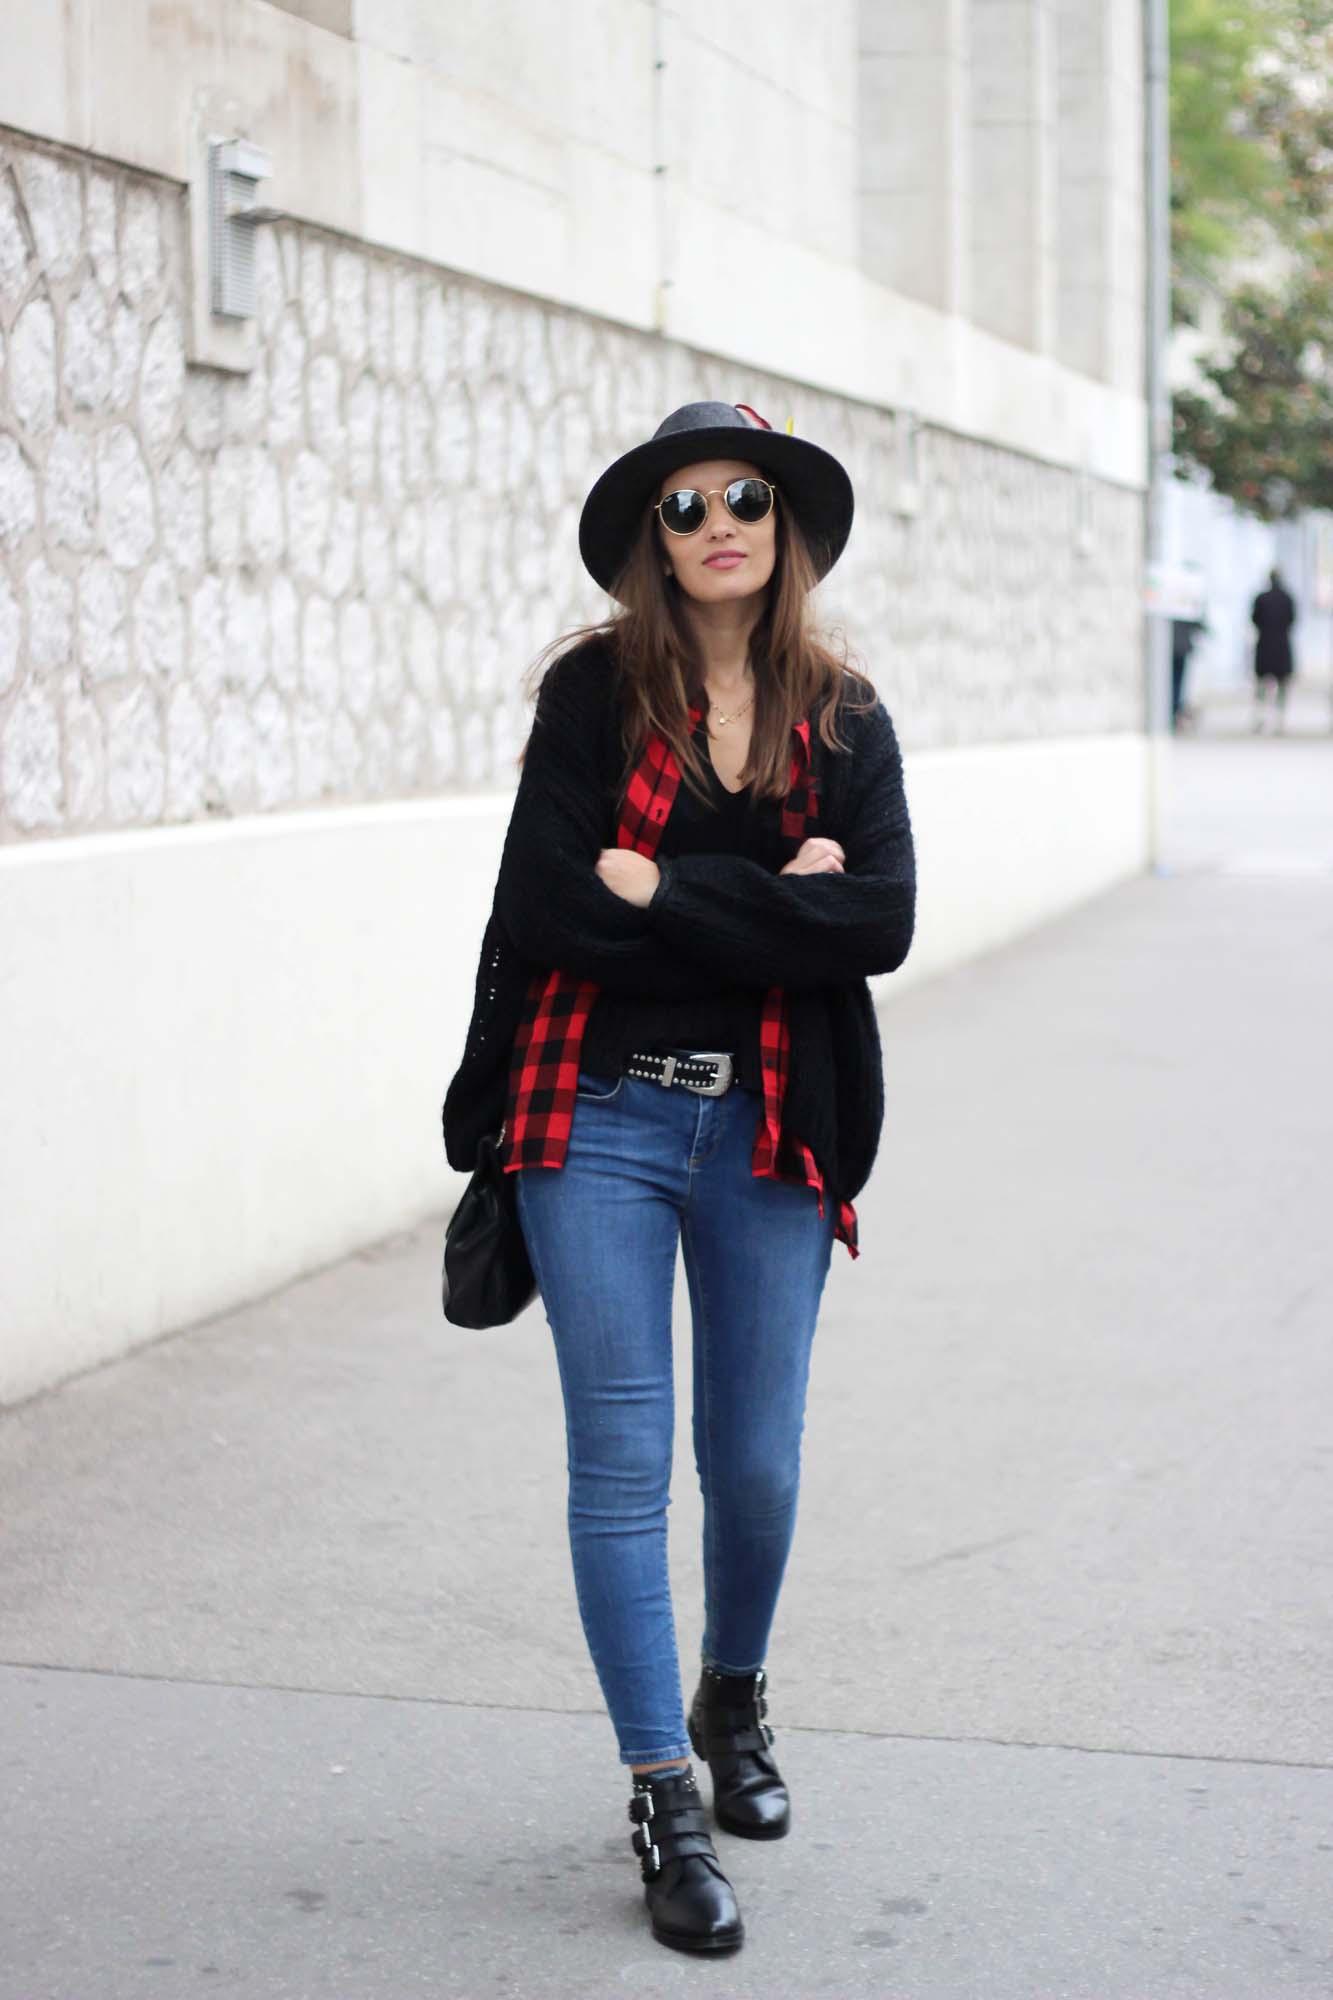 blog-mode-look-chemise-carreaux-rouge